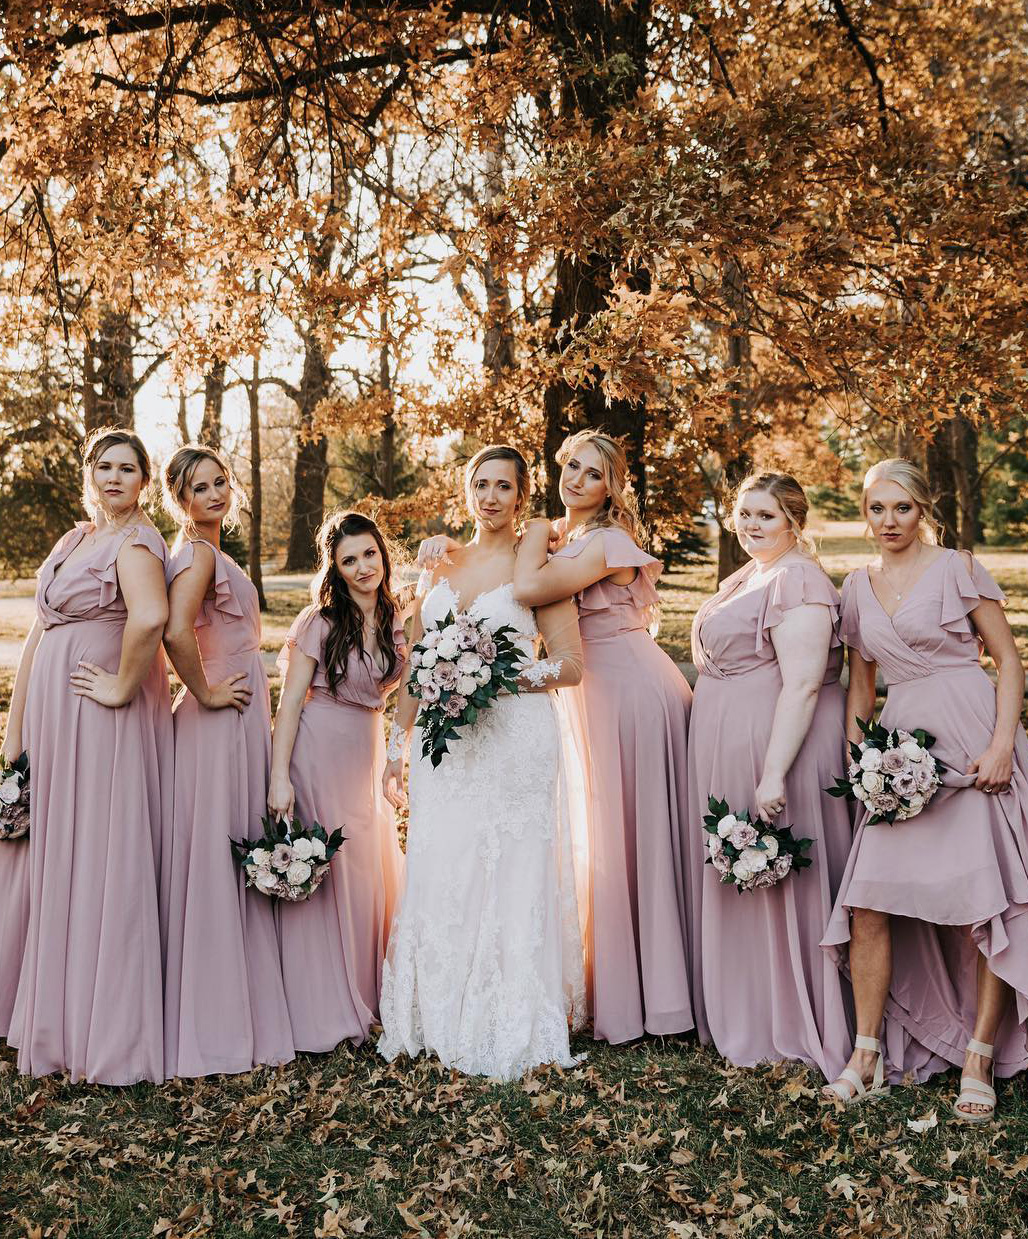 pesta pengantin mengenakan gaun pengiring pengantin kuarsa dengan lengan bergetar